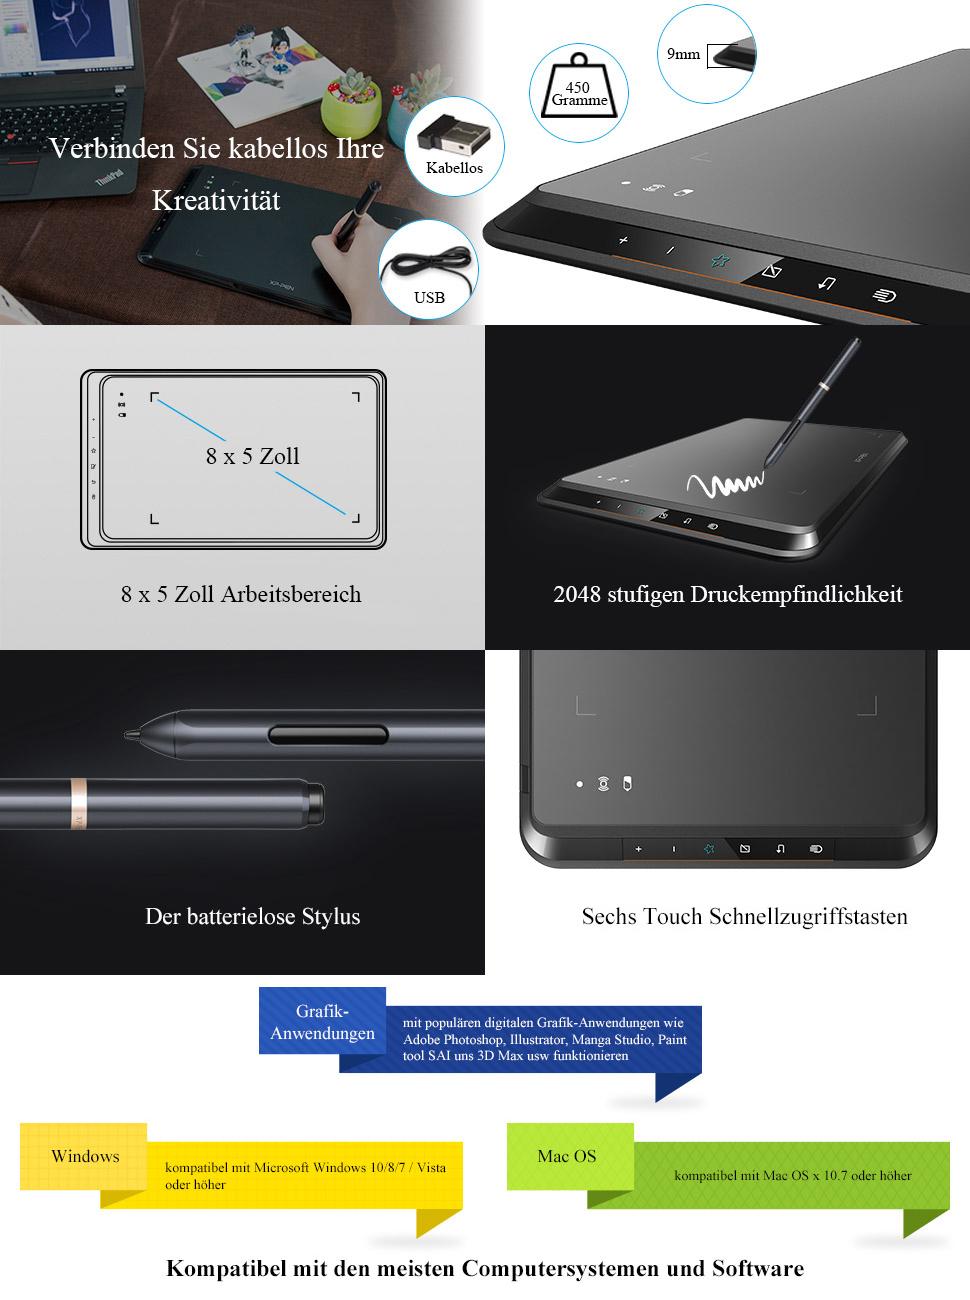 Kabellos cool rear kabellos test kef kef wireless stereo - Led christbaumkerzen kabellos test ...